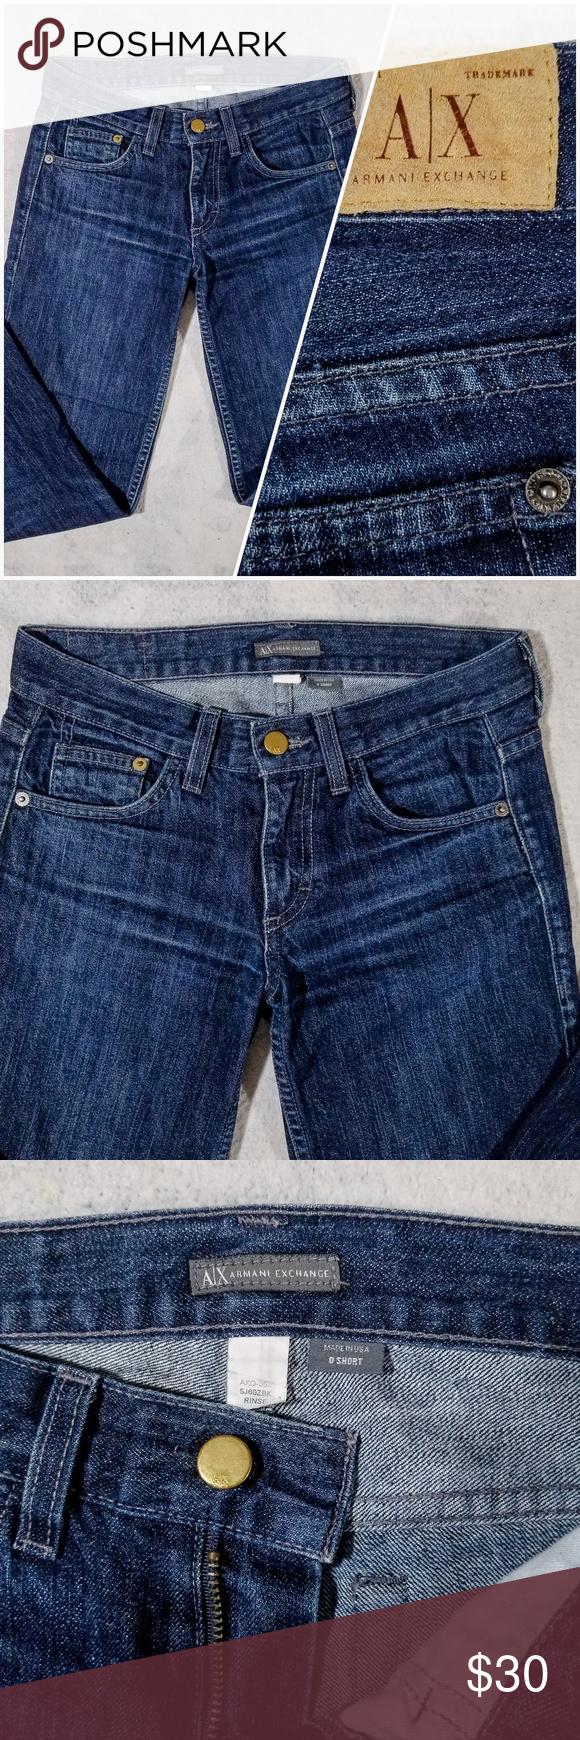 ff1db4660d7 Armani Exchange AX Dark Blue Denim Jeans